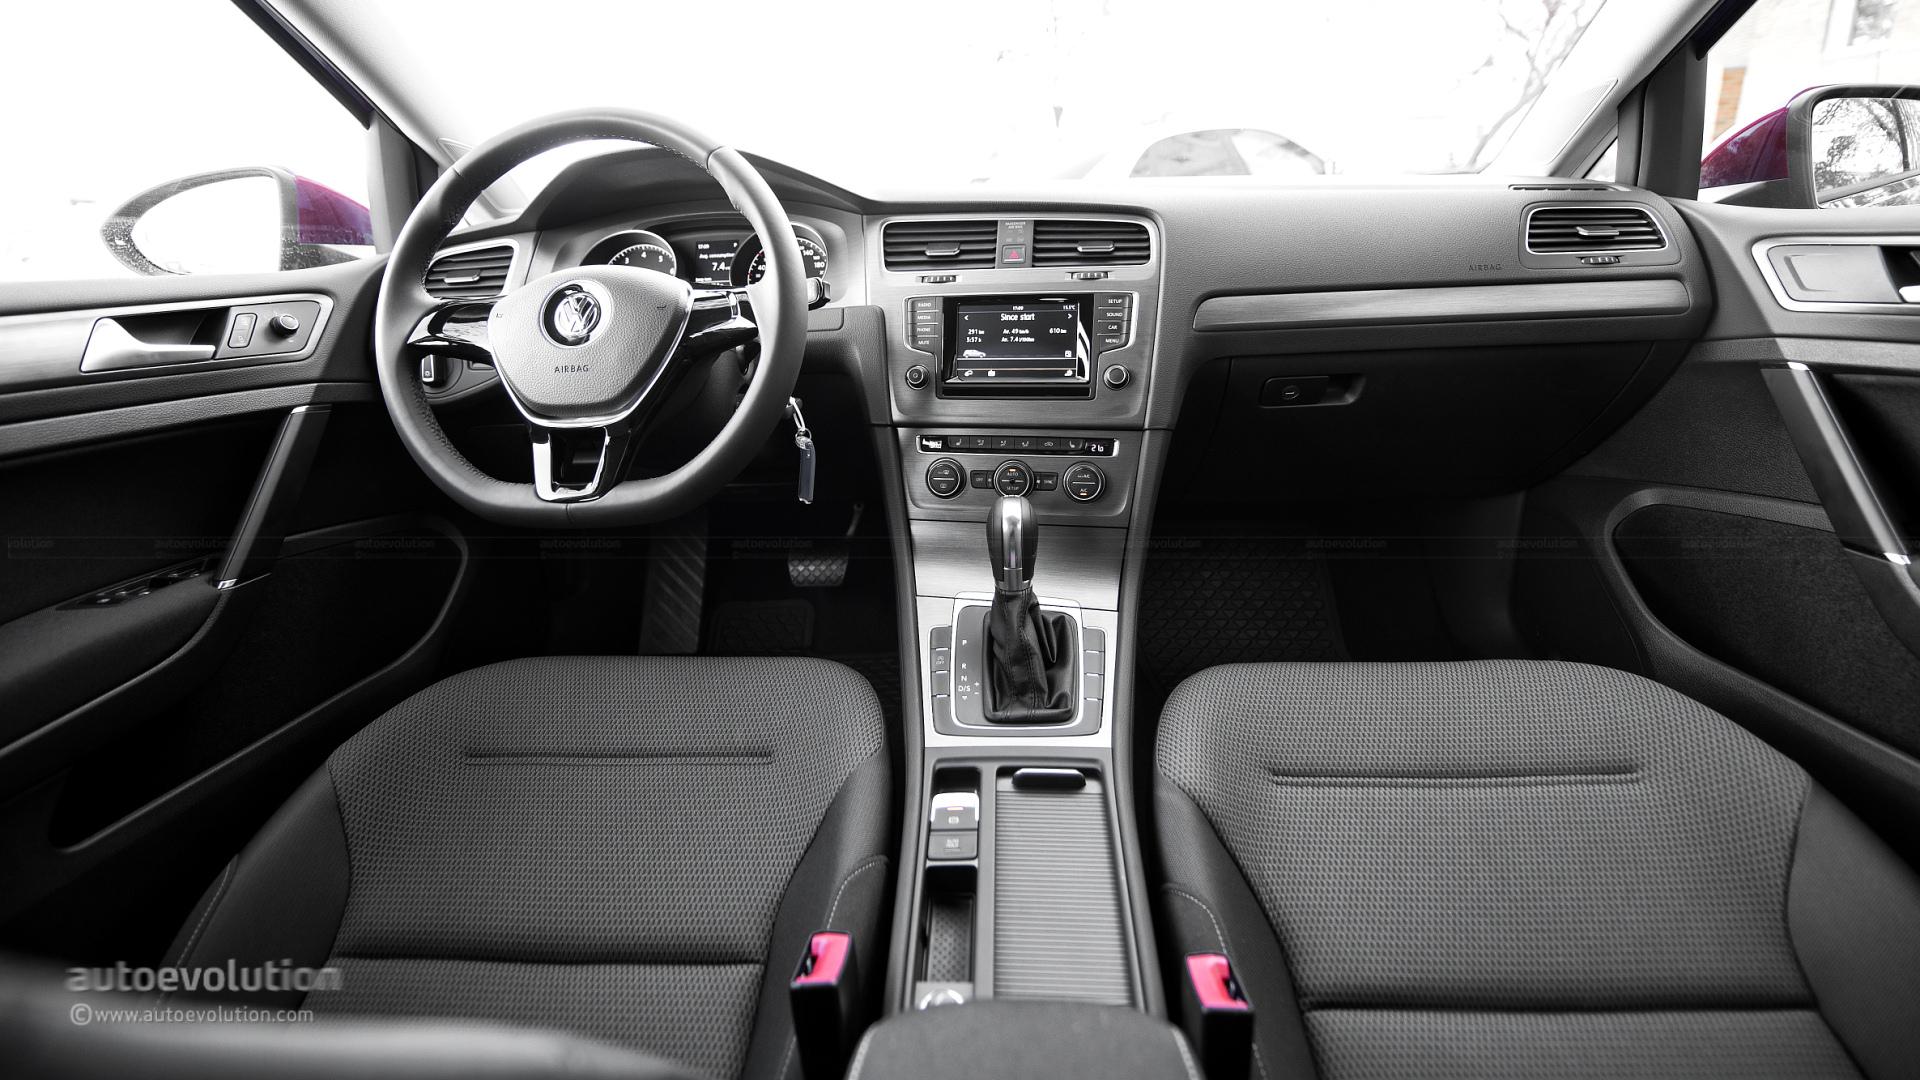 volkswagen golf 7 review autoevolution